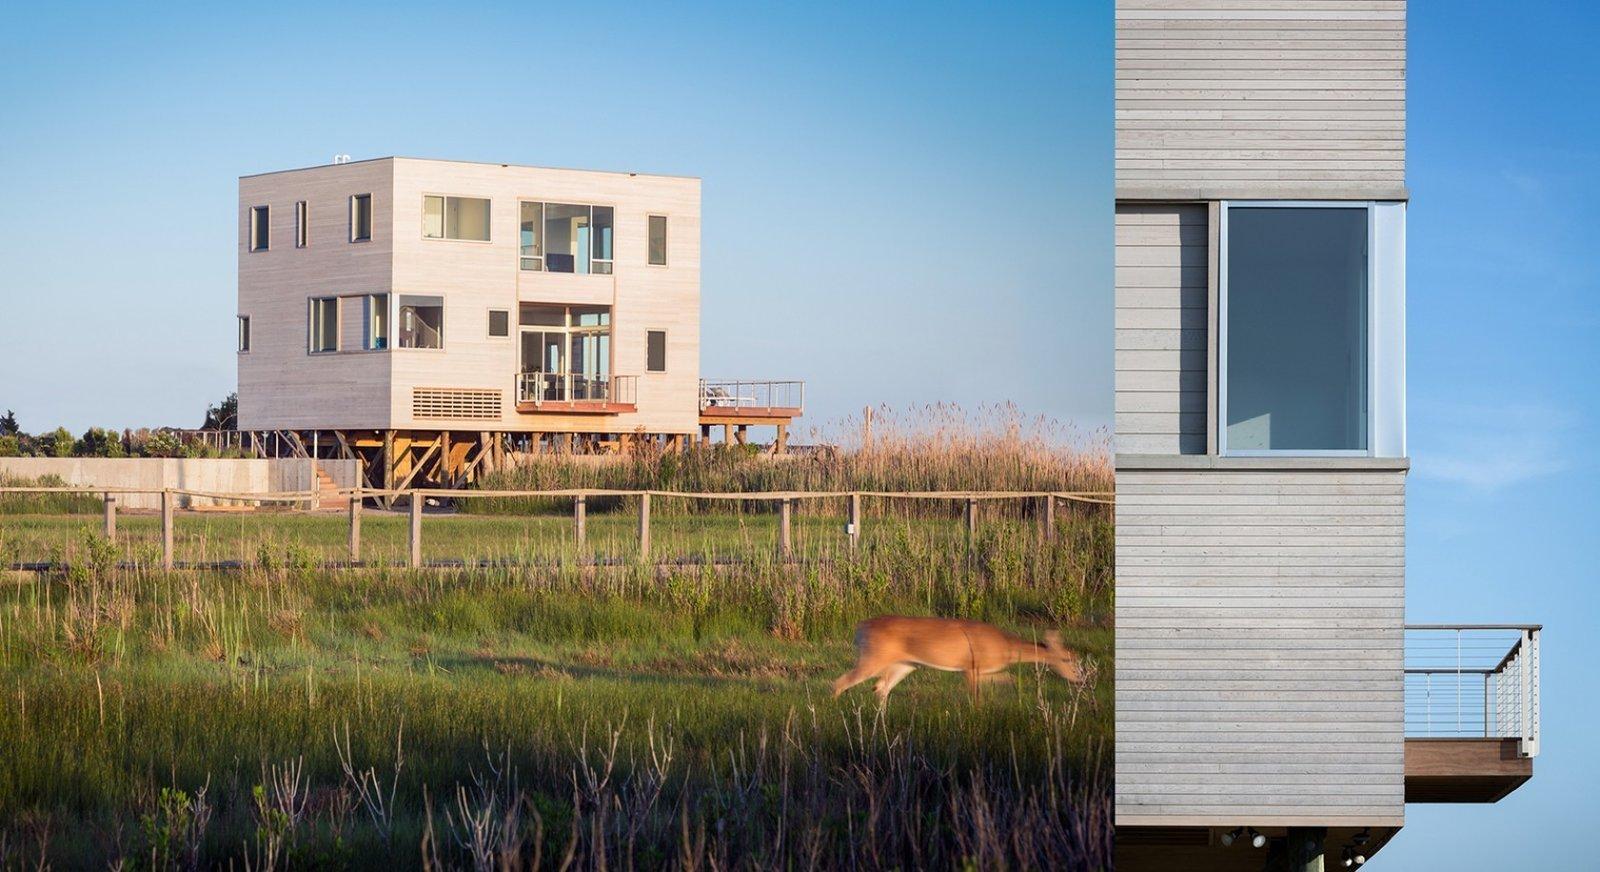 #CubeHouse #modern #cube #exterior #outside #landscape #windows #deck #timber #wetlands #cedar #retreat #privacy #dynamic #naturallighting #Westhamptonbeach #NewYork #LeroyStreetStudio   Cube House